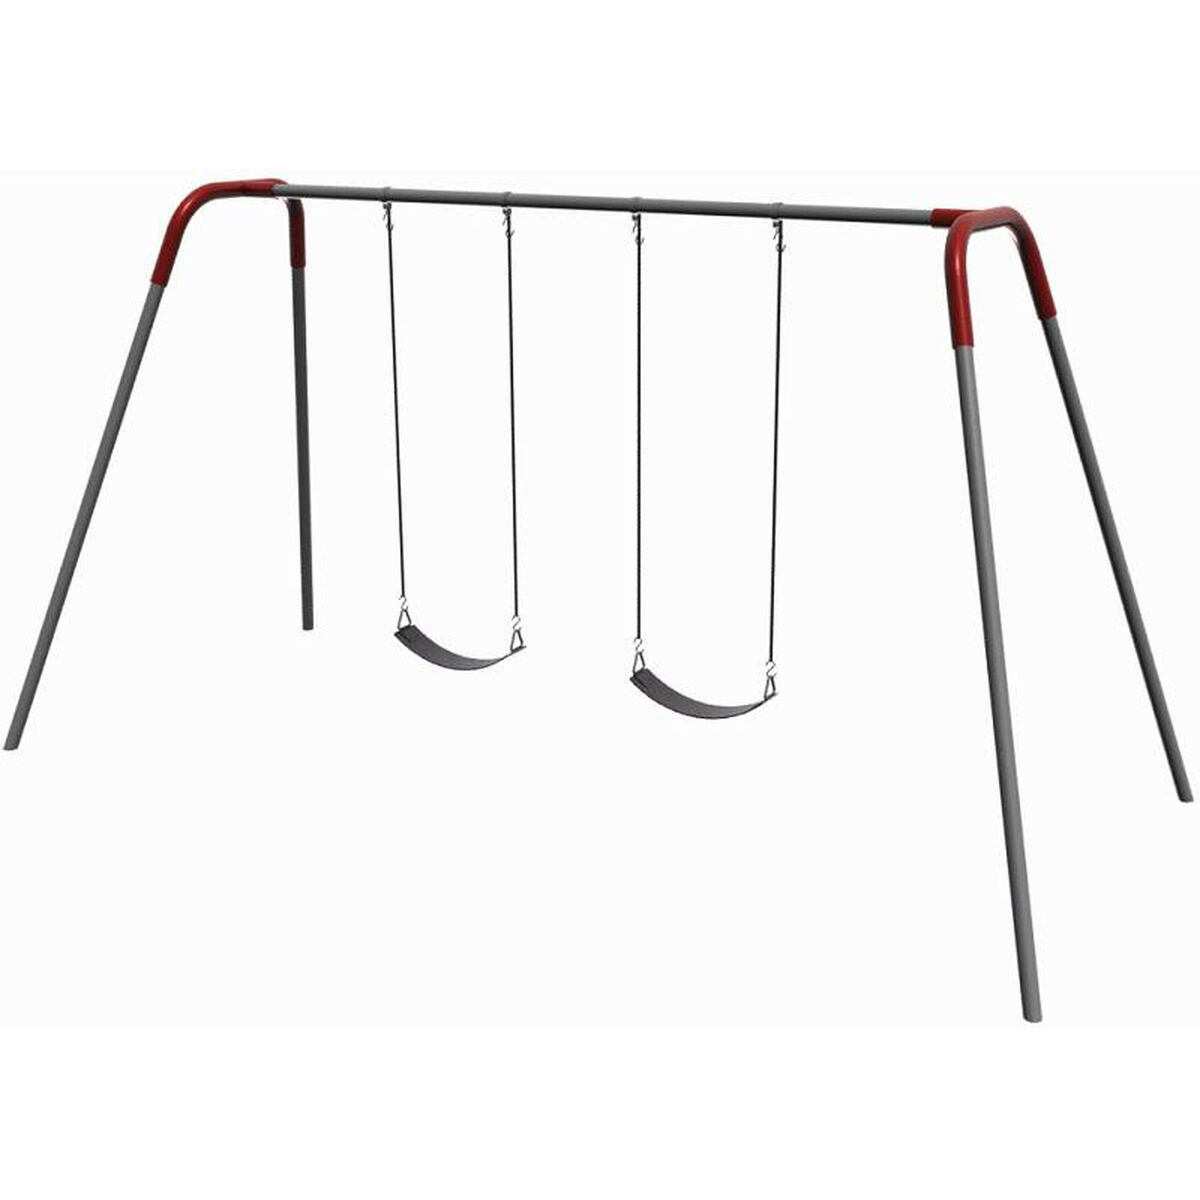 2 Seat Modern Bipod Swing Set 581 238 Churchchairs4less Com